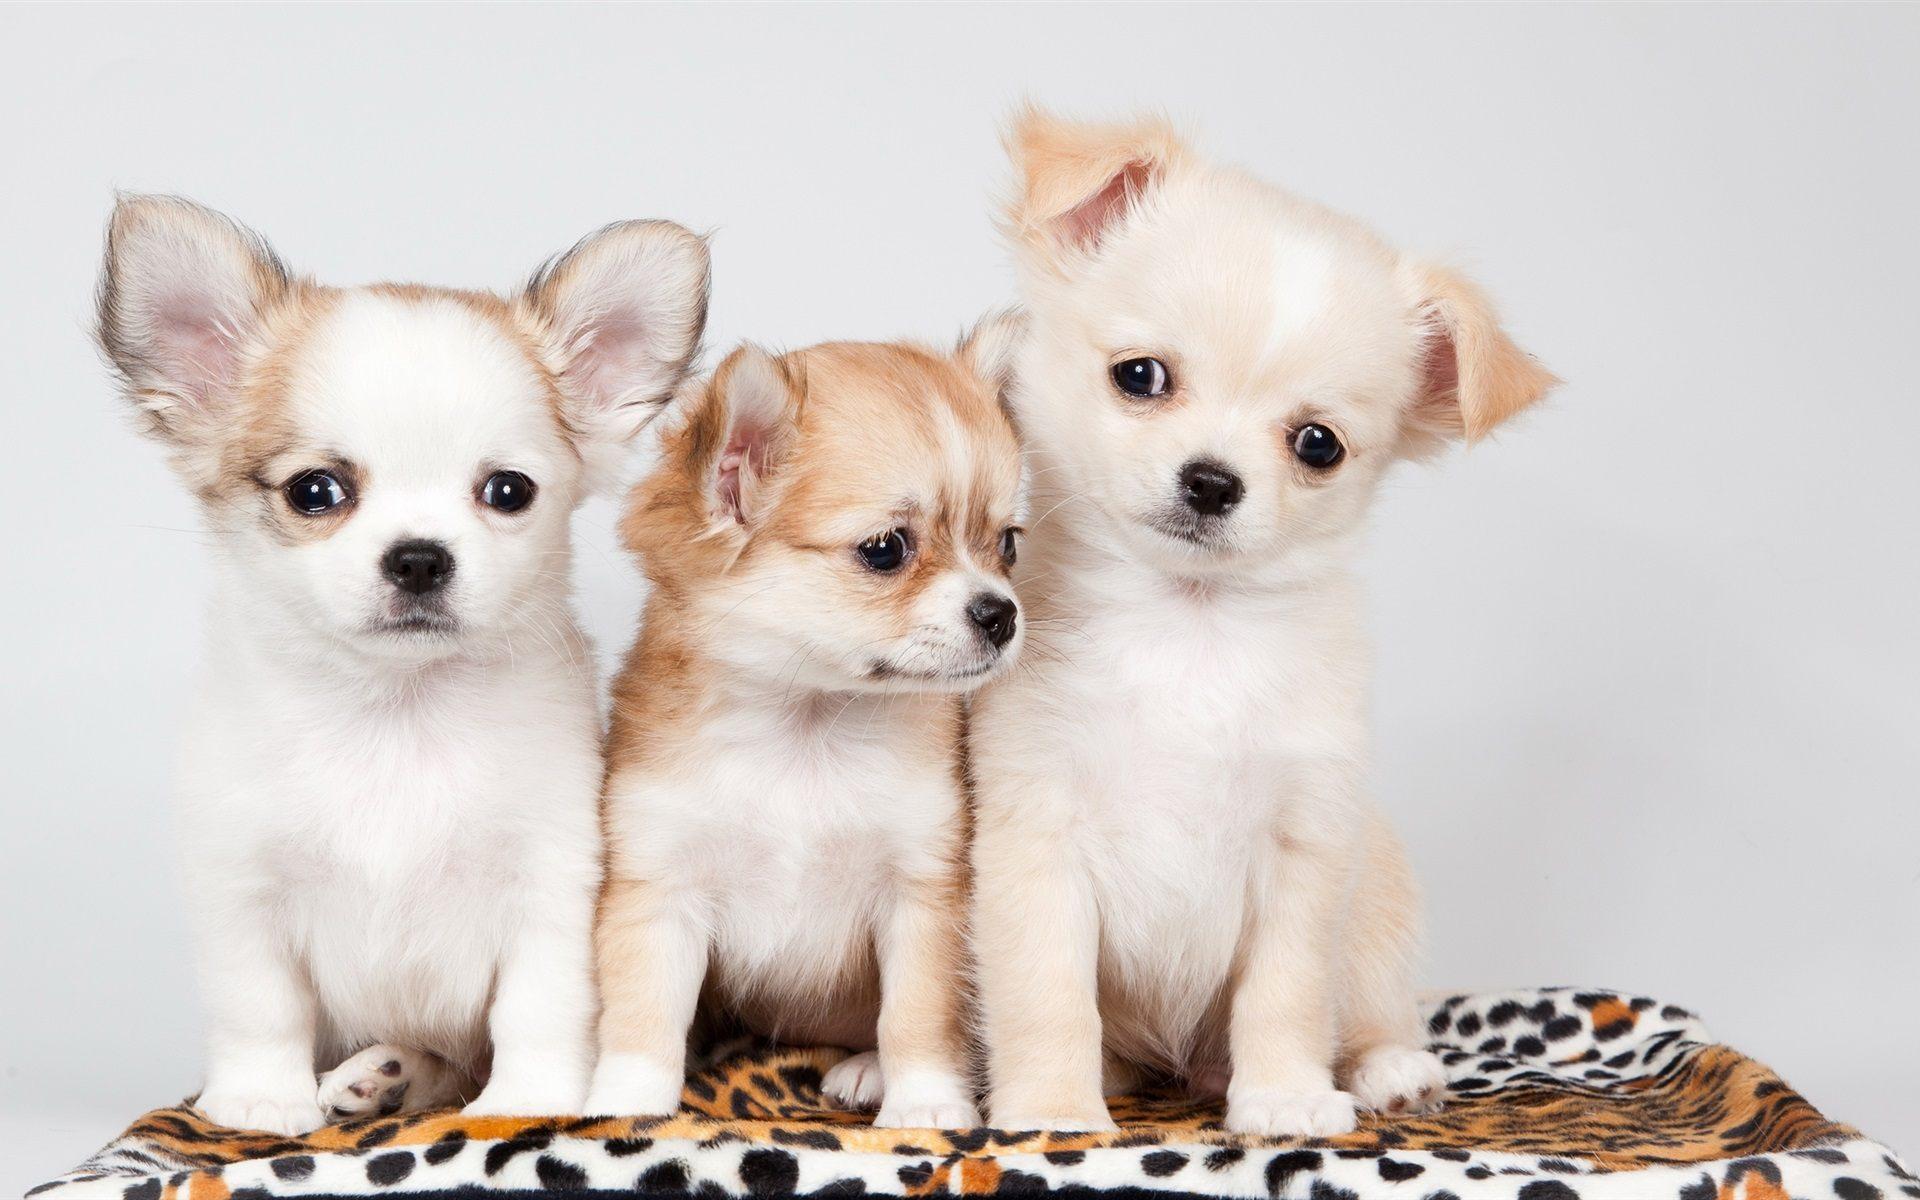 cute-puppies-wallpaper-wpc9003944